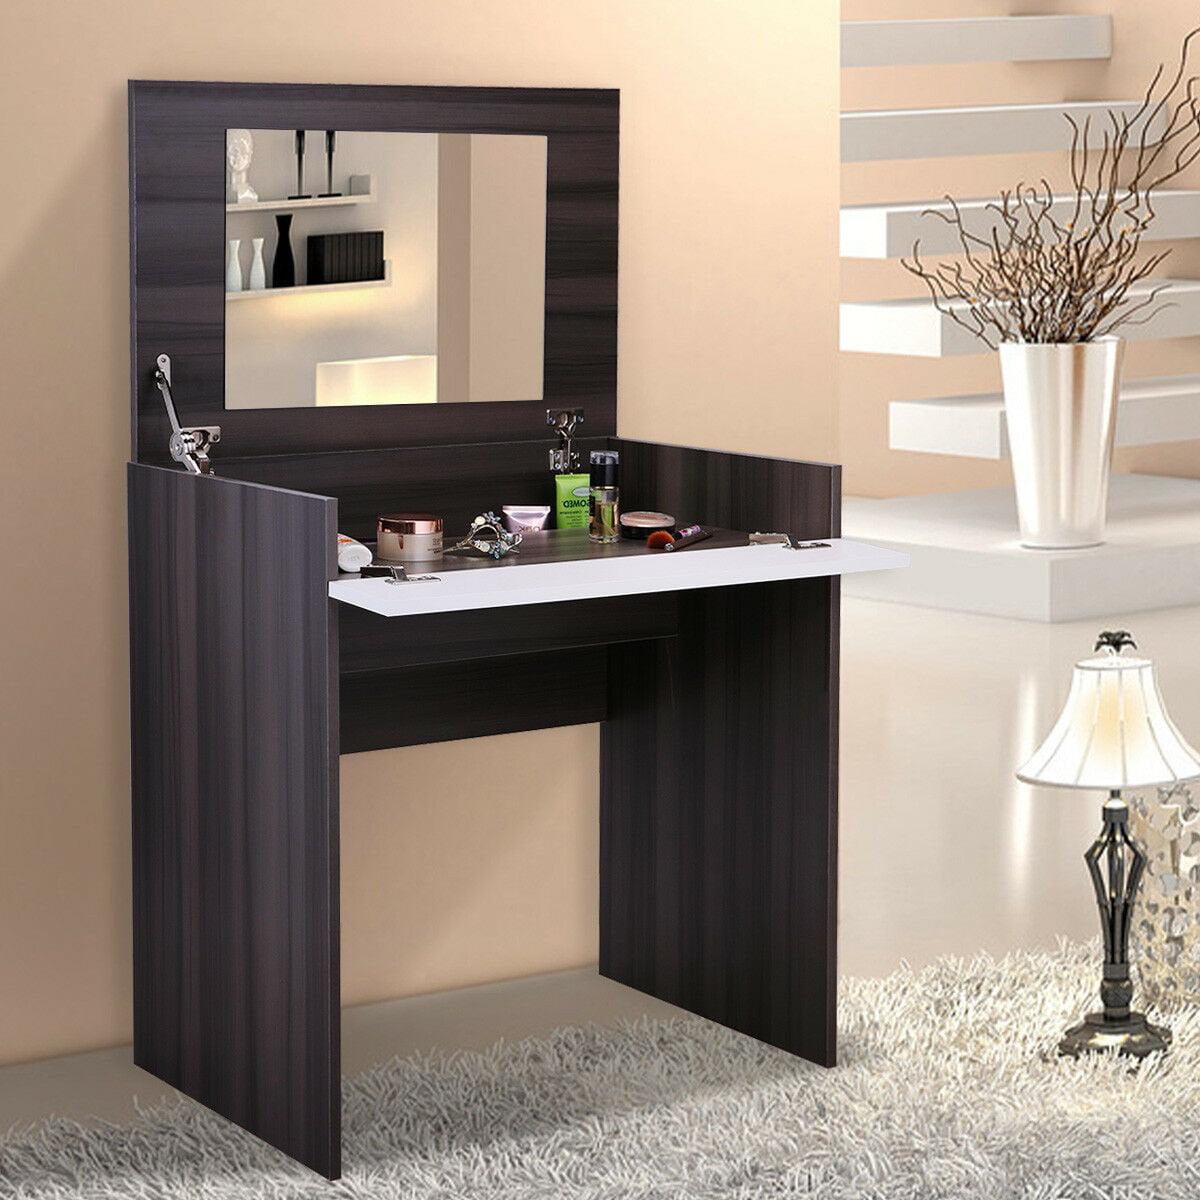 Veryke Vanity Set Makeup Vanity Table For Bedroom Makeup Table Dressing Table With Flip Up Mirror And Hidden Storage Box Ebony Walmart Com Walmart Com